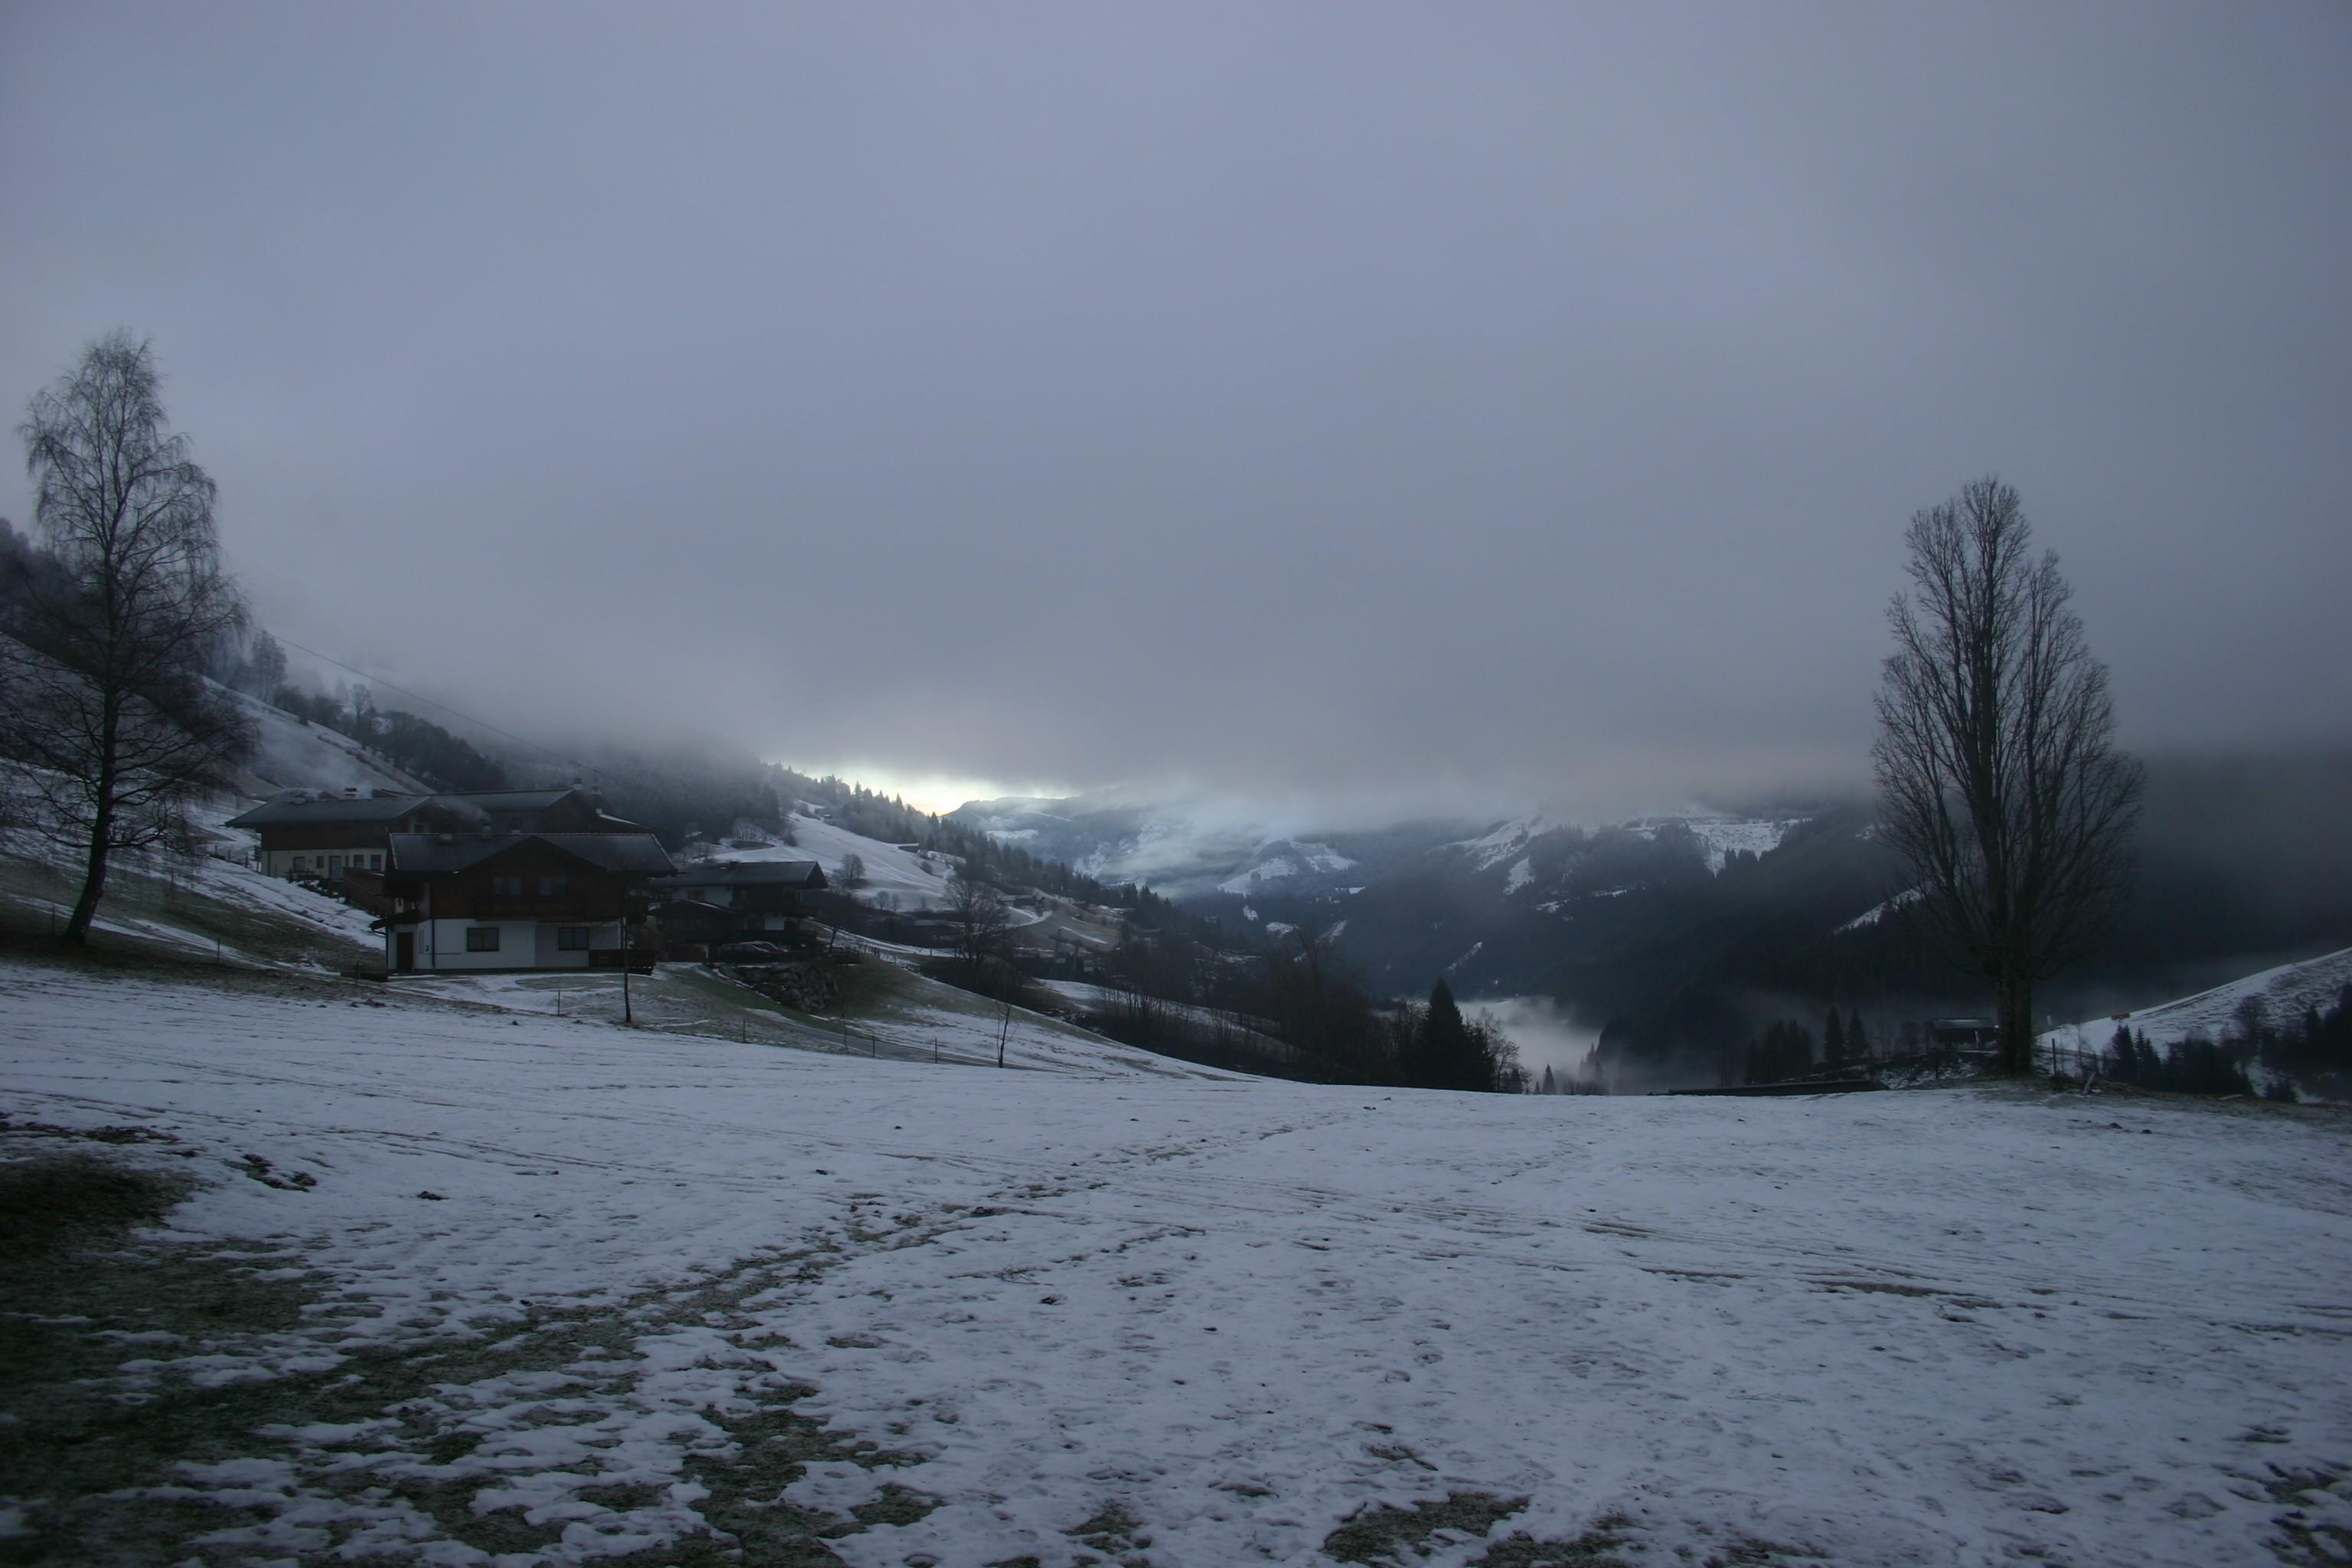 Skicircus Saalbach Hinterglemm Leogang 002 - Dag 1